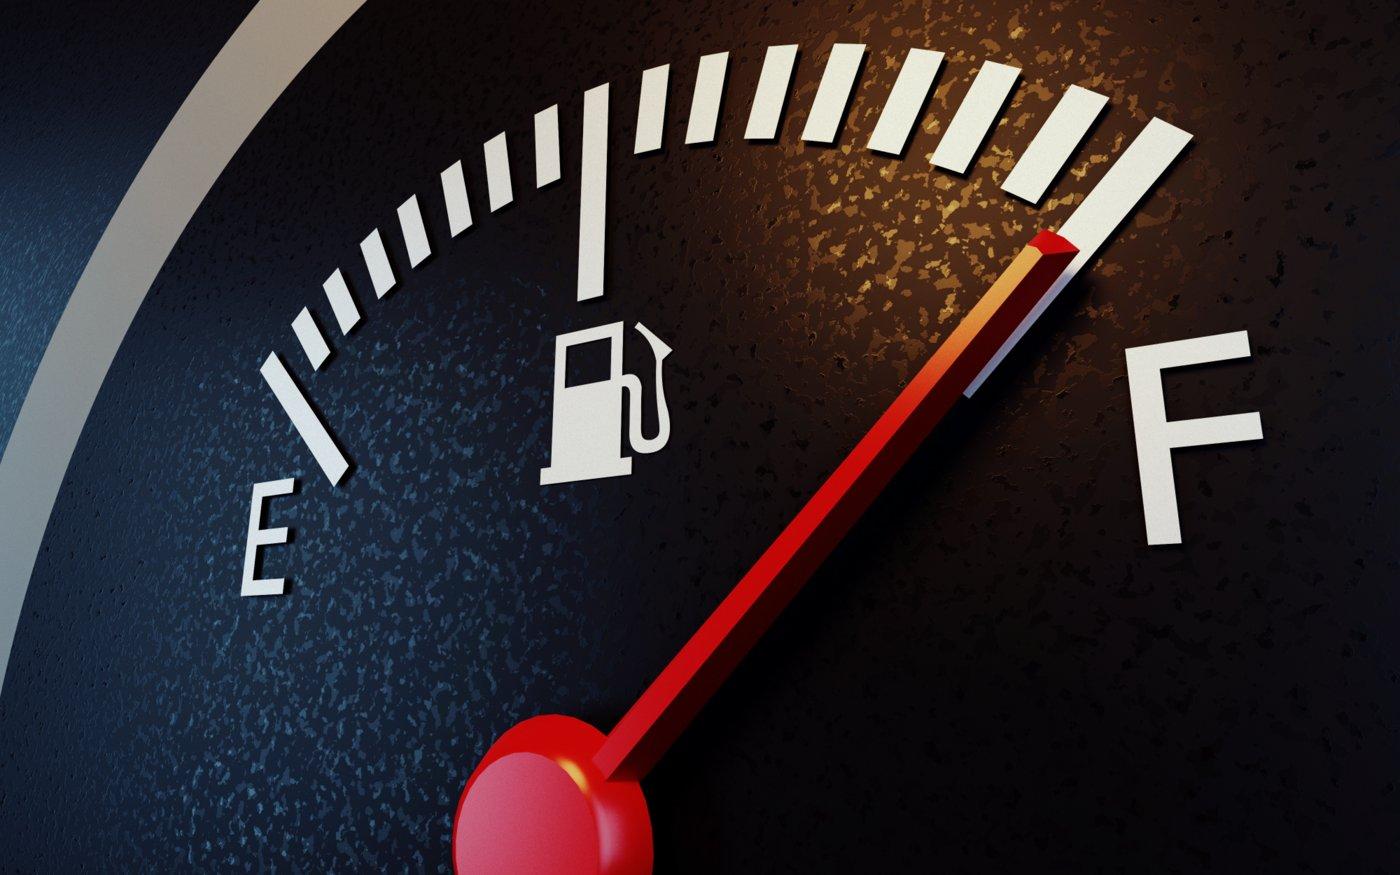 Gas gauge on full